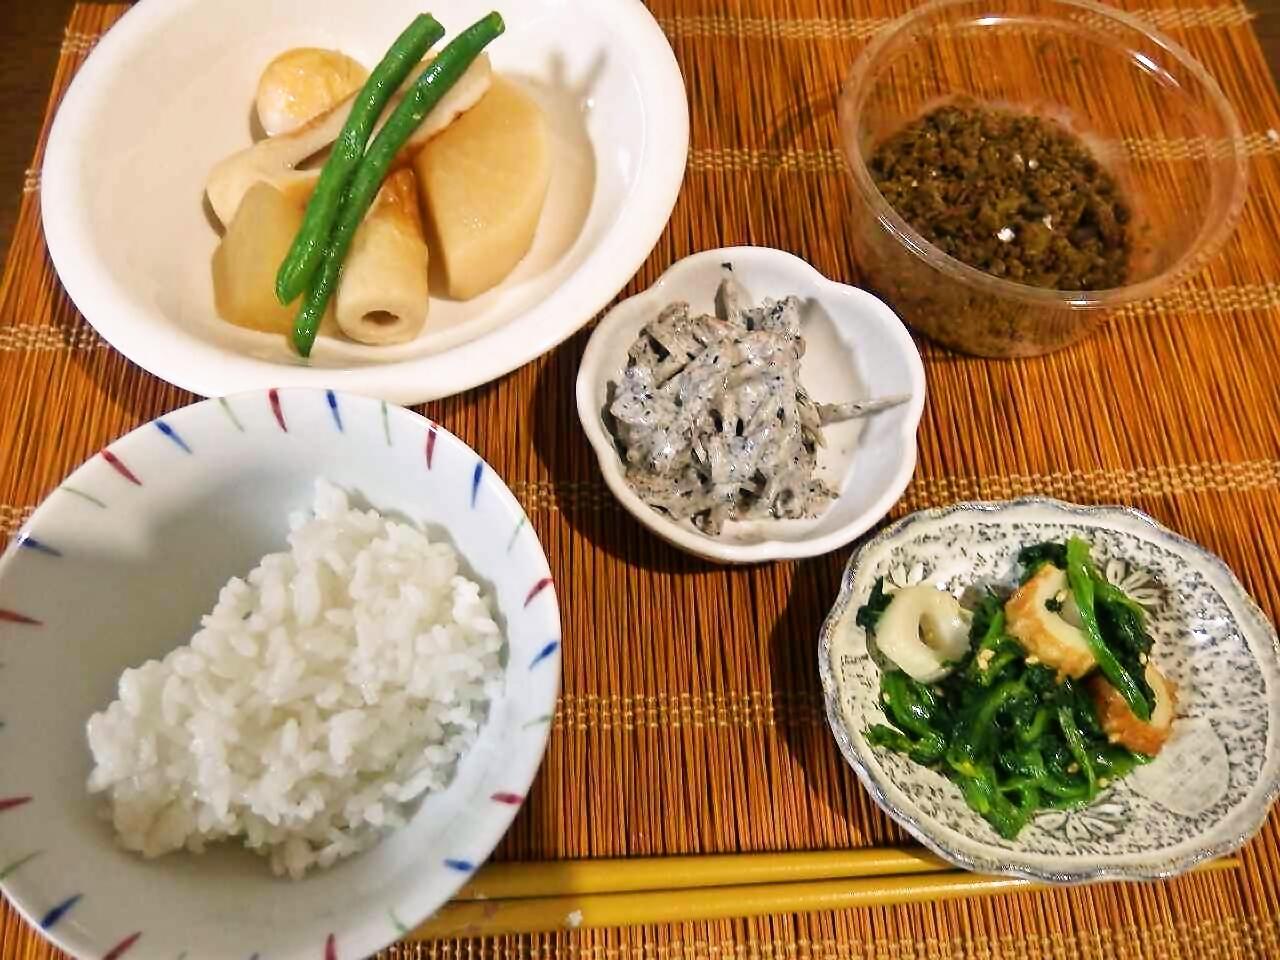 foodpic6024742.jpg